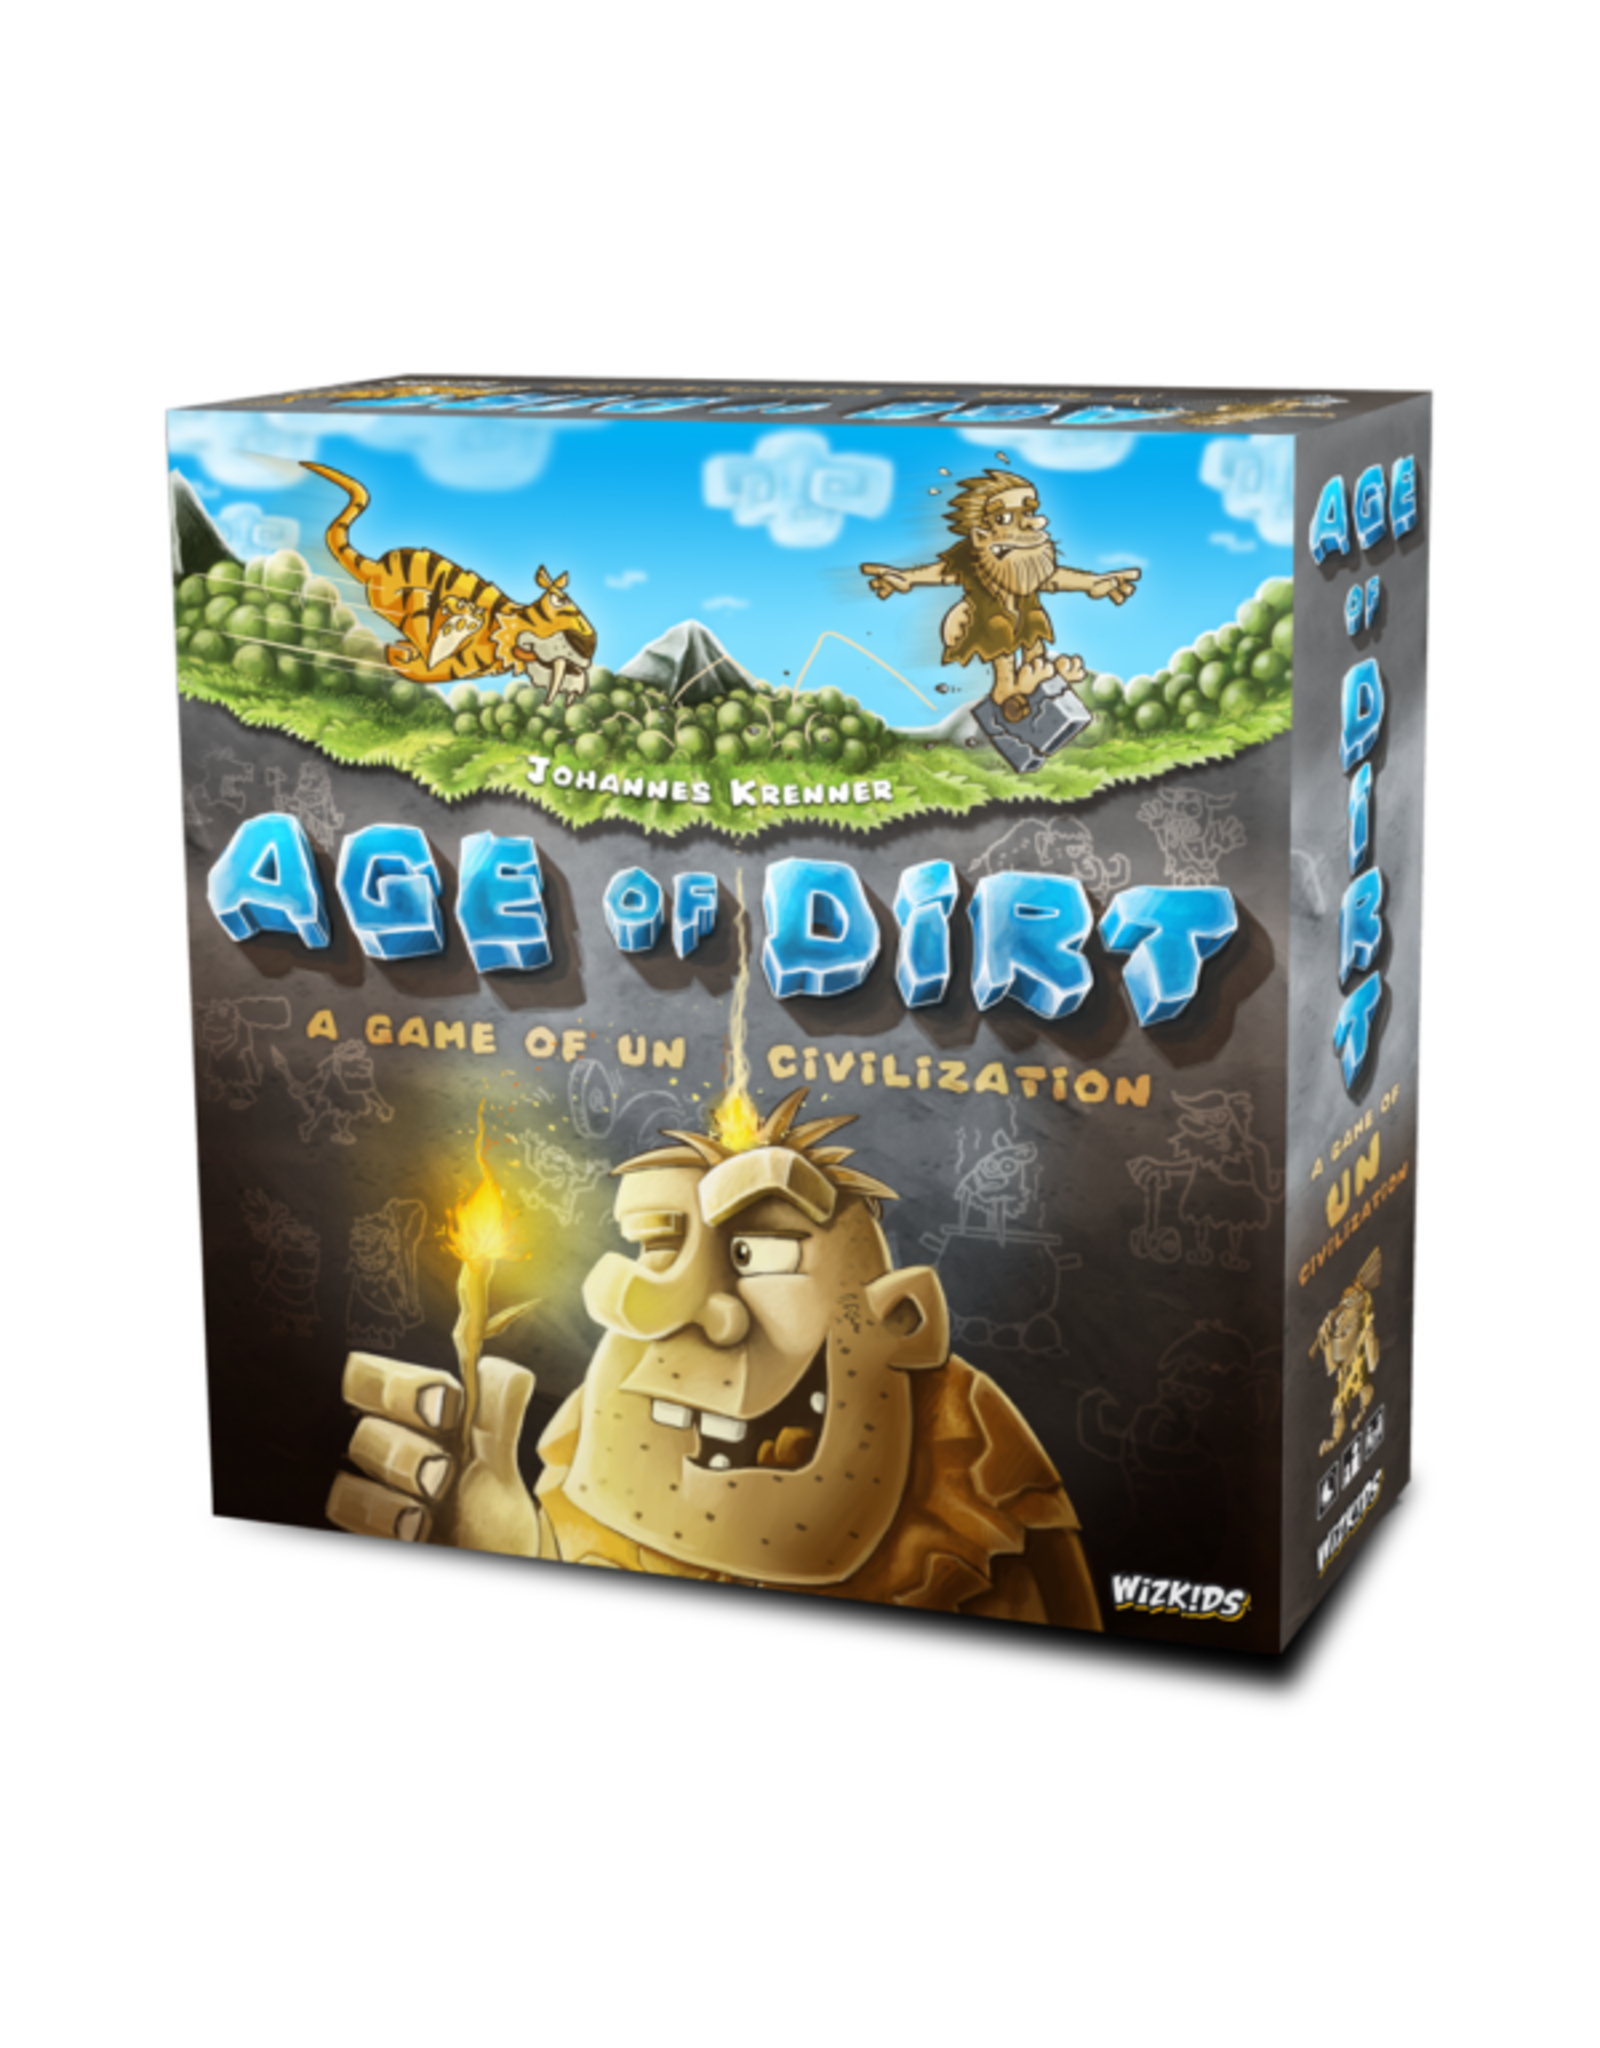 Wizkids Age of Dirt